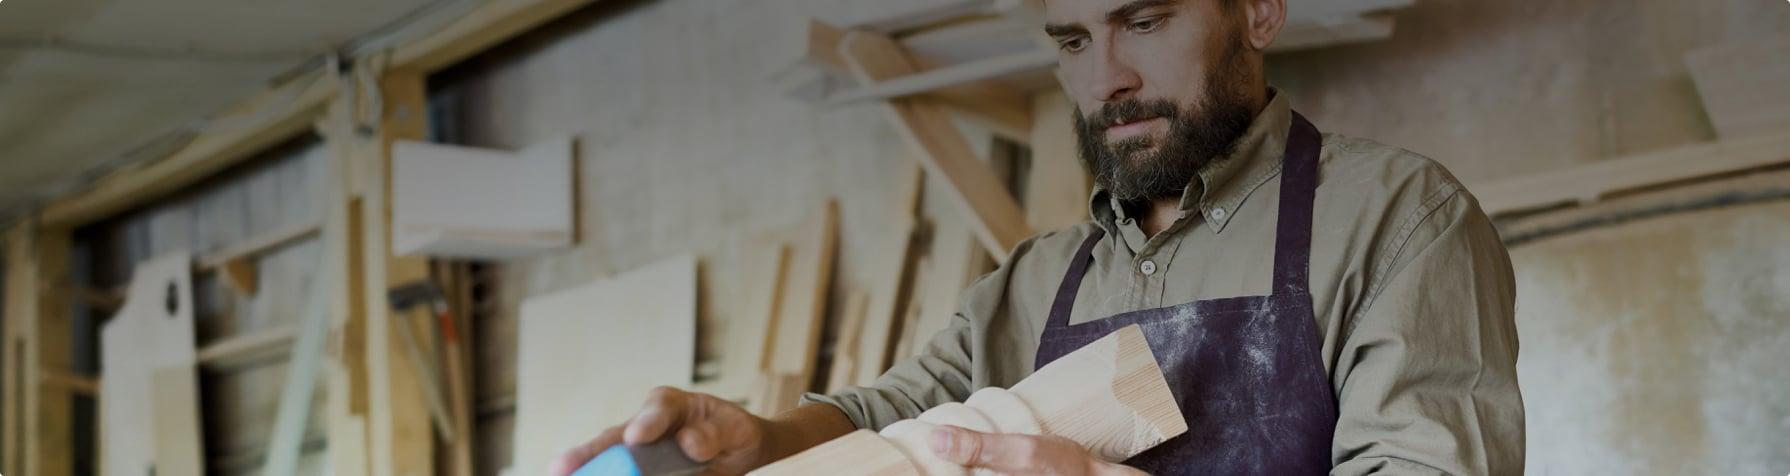 Carpenter liability insurance cost and coverage - Desktop